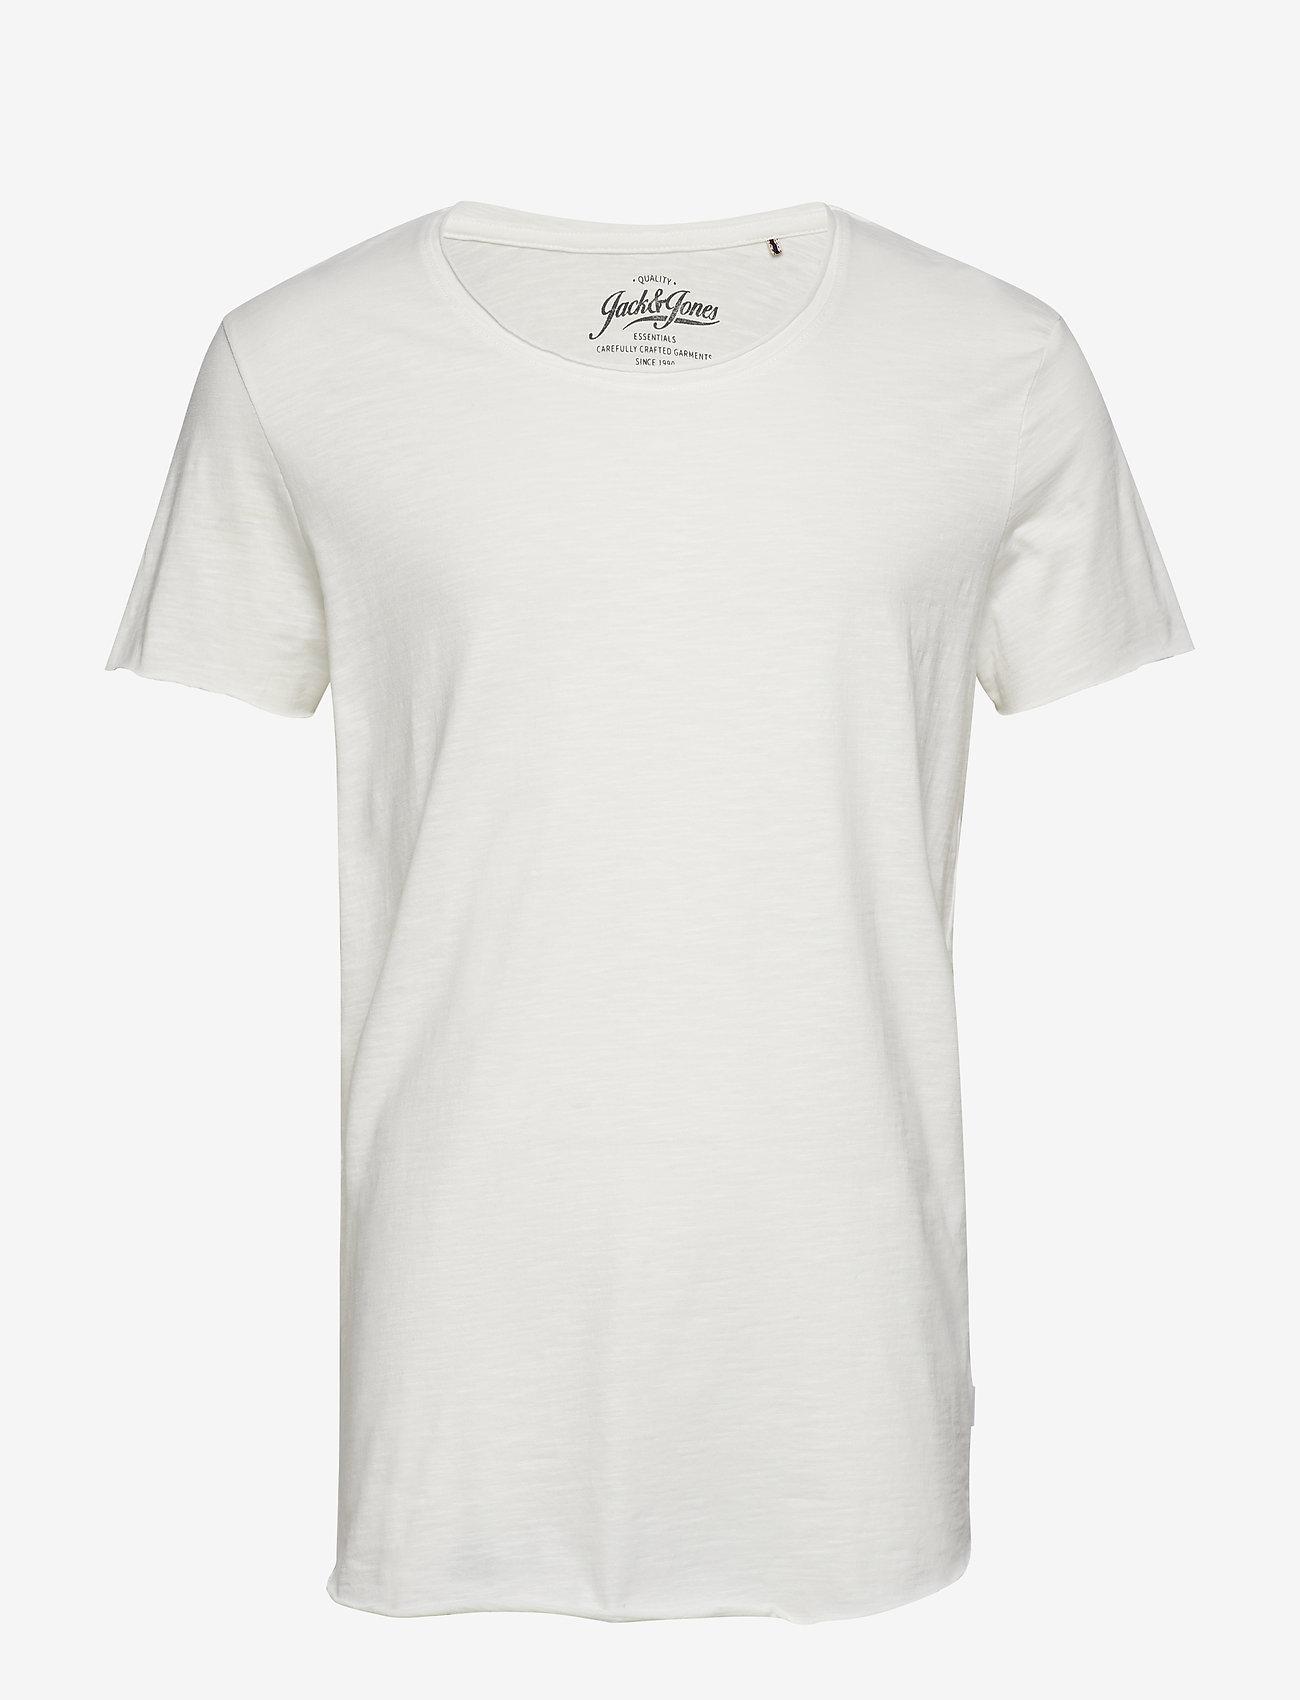 Jack & Jones - JJEBAS TEE SS U-NECK - basic t-shirts - cloud dancer - 0